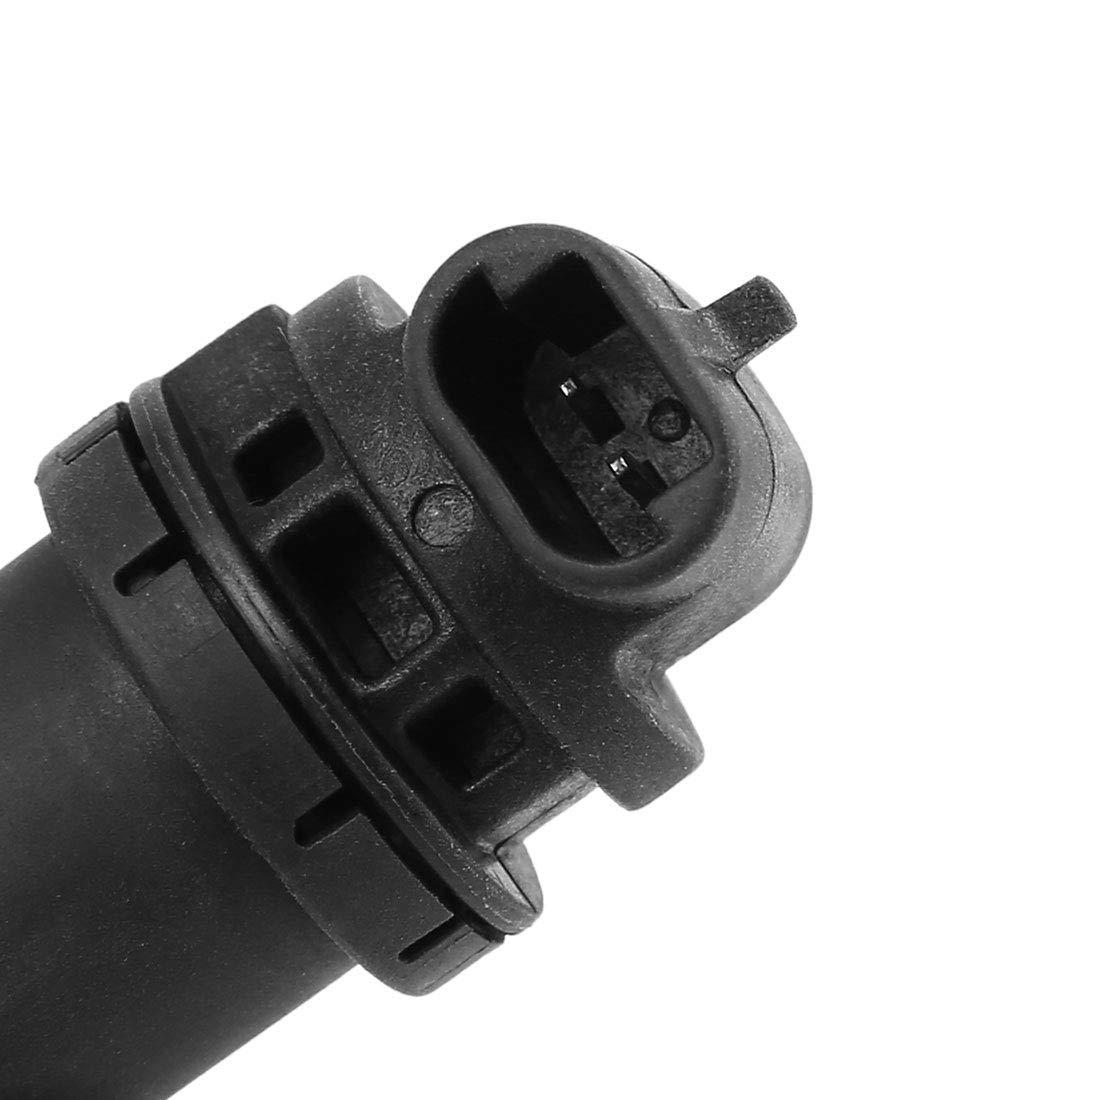 uxcell 10456509 Vehicle Speed Sensor for Buick Regal Chevrolet Malibu Oldsmobile Regency Pontiac Grand